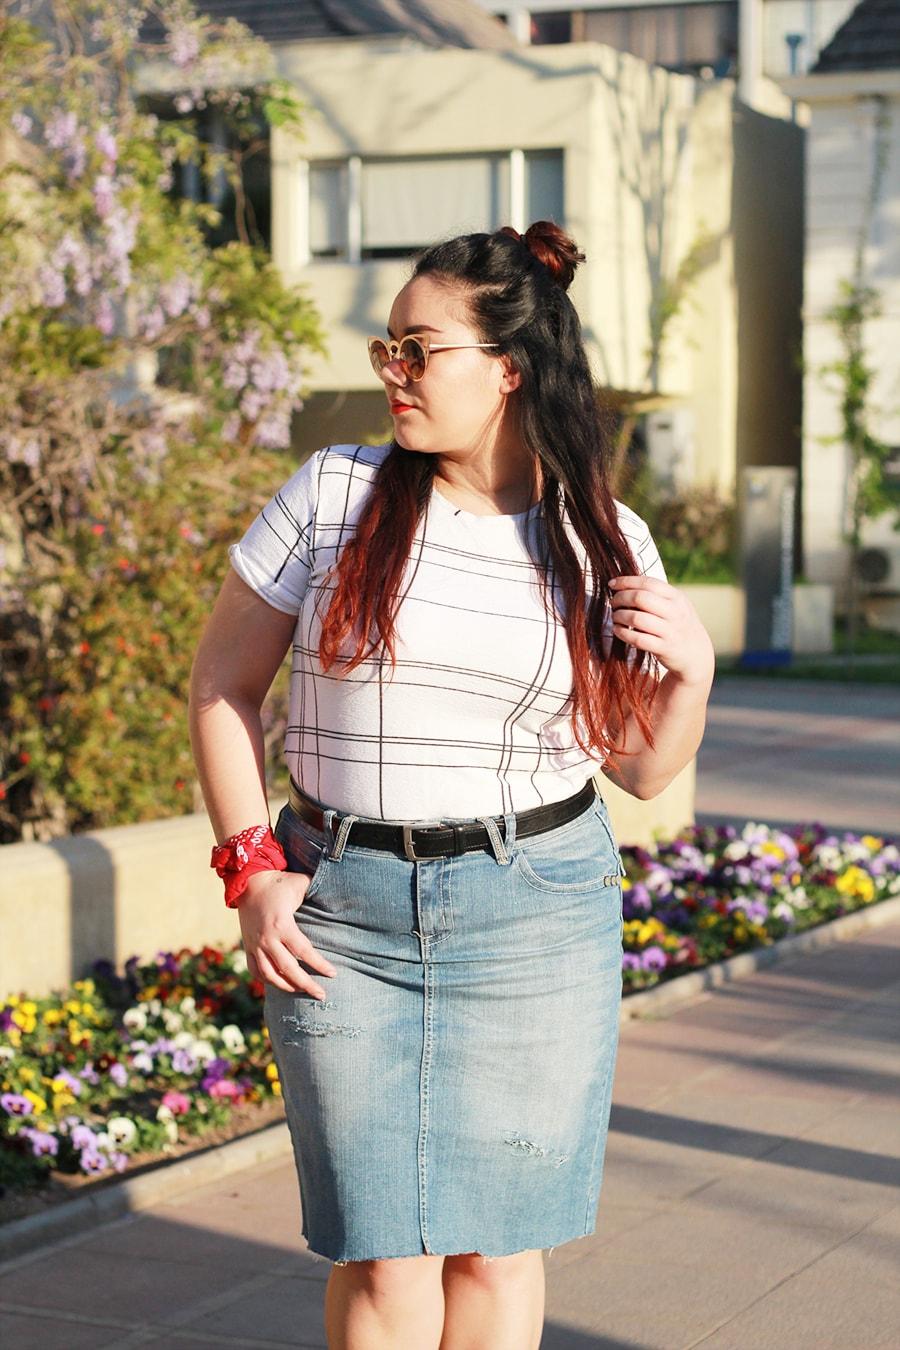 Feminista rompiendo estereotipos - Blogger Mexicana - Moda plus size - Golden Strokes